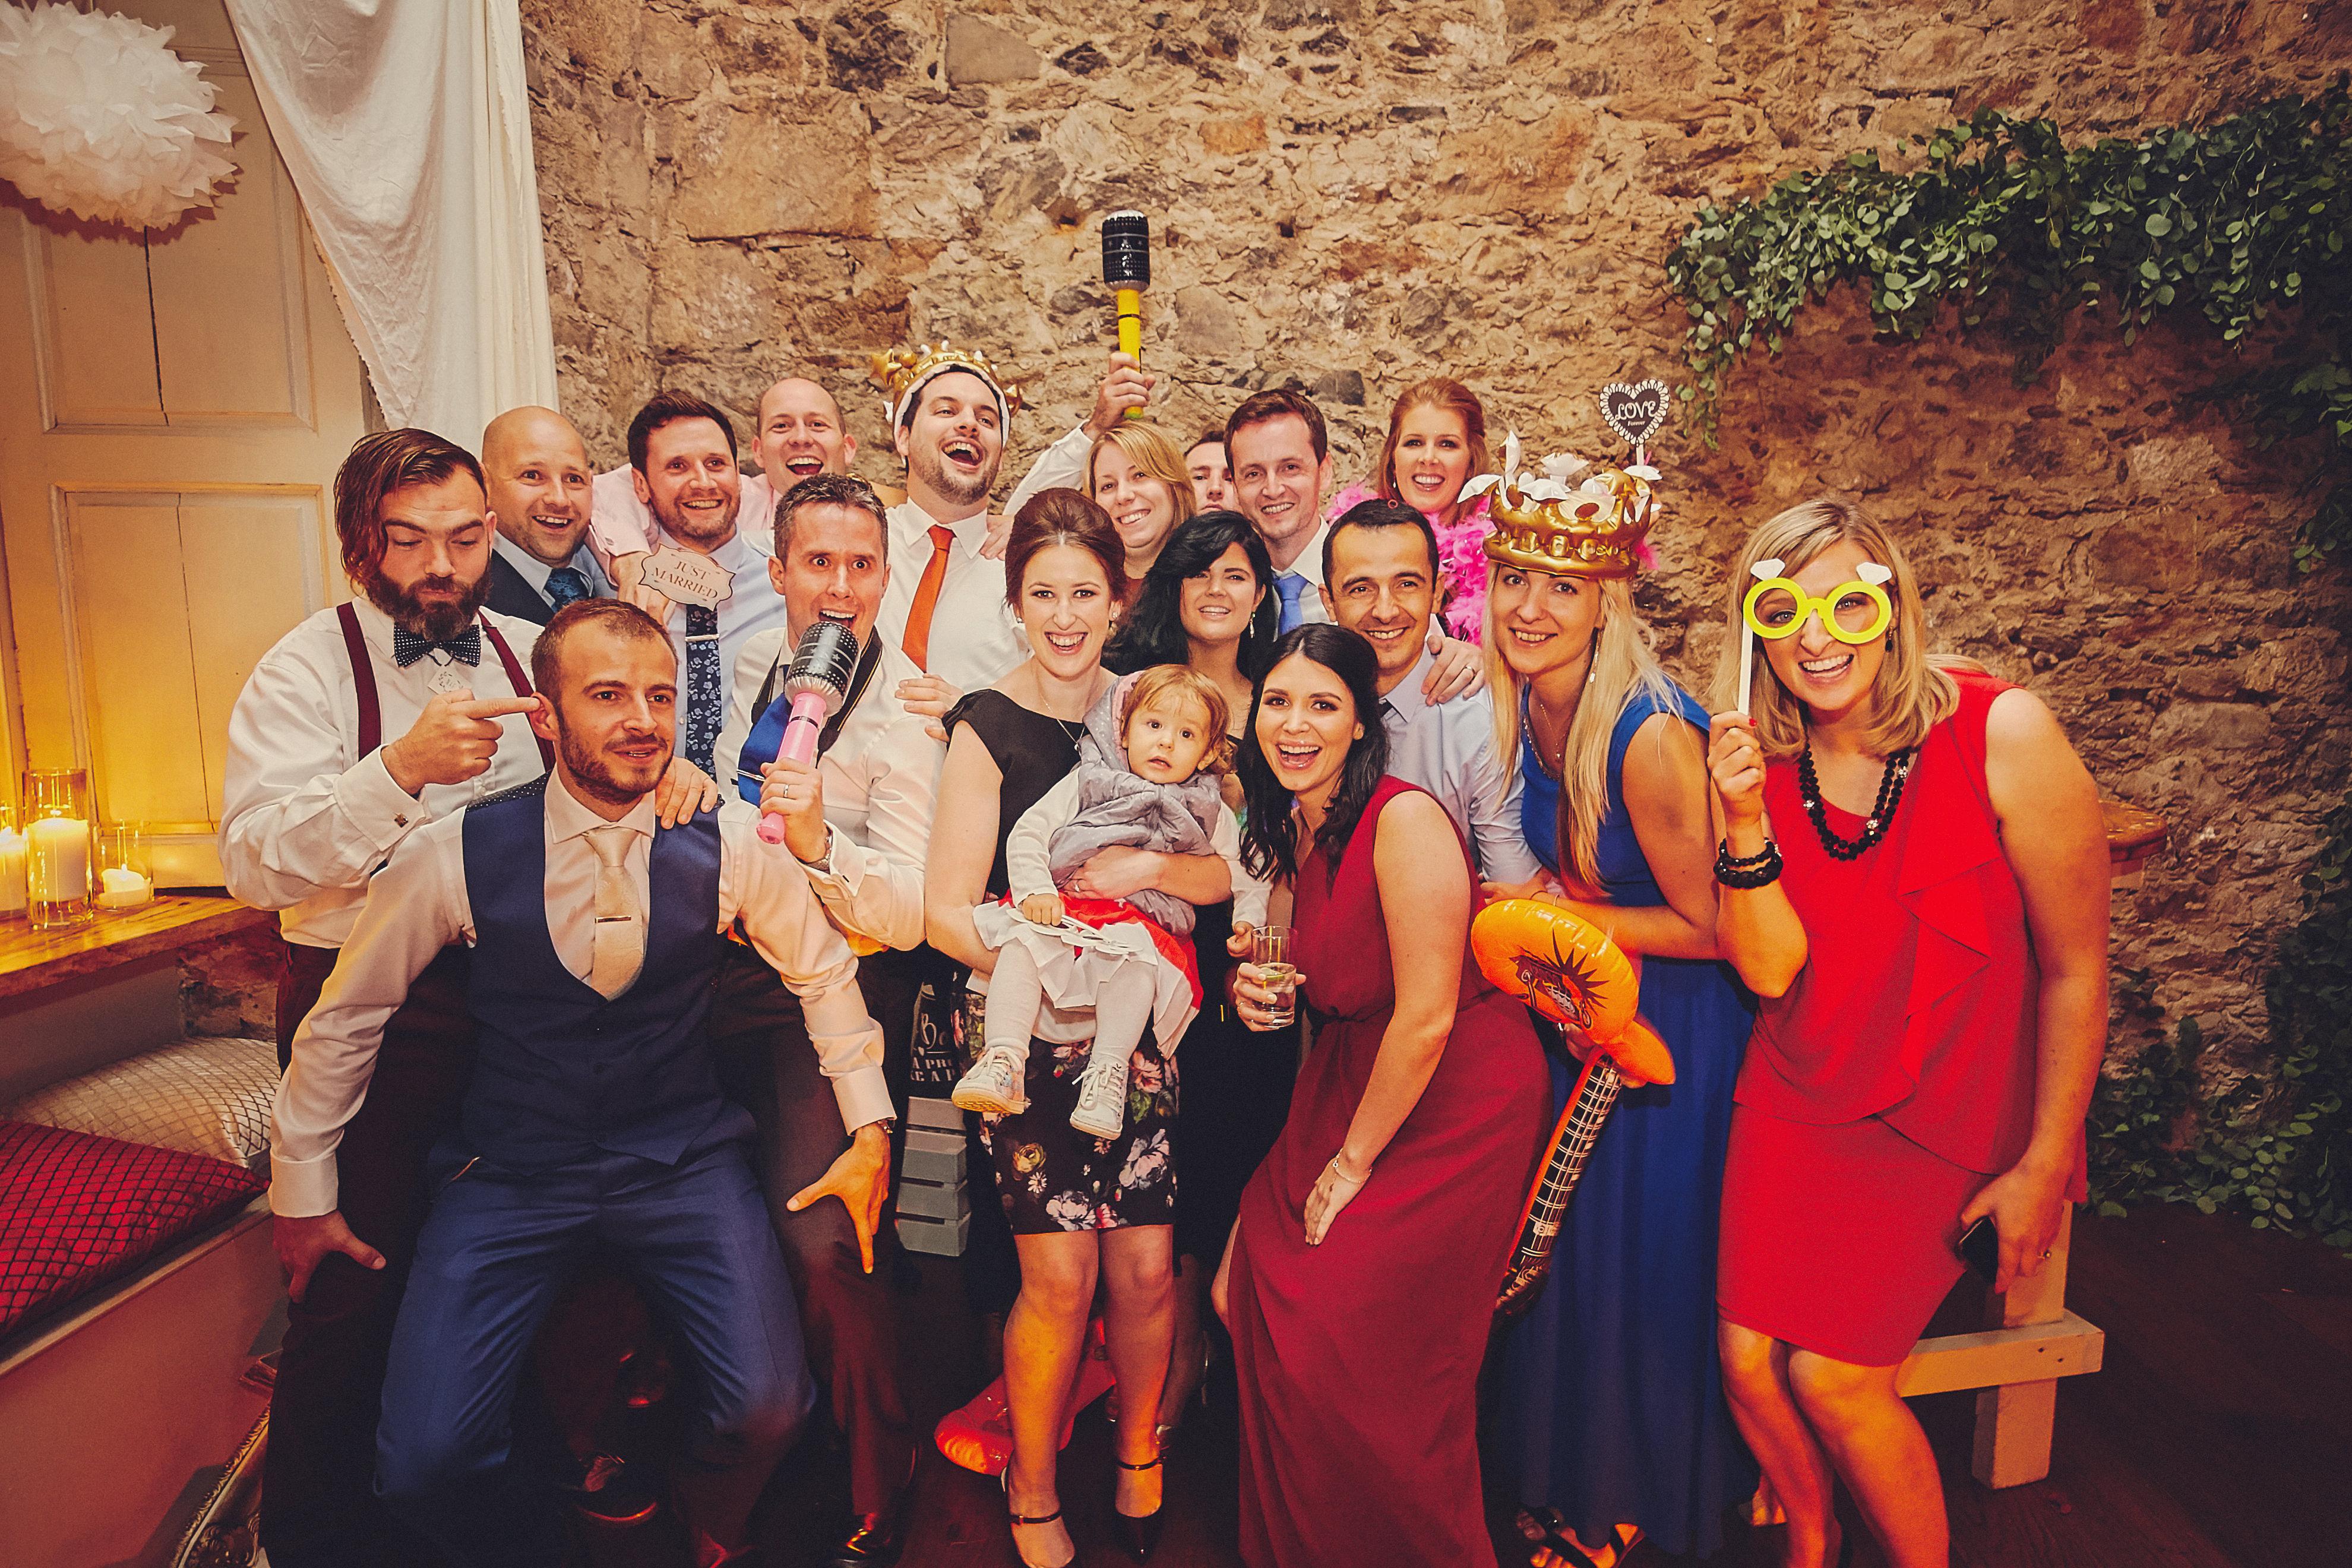 Cloughjordan House weddding154 - Cloughjordan House Wedding - Alternative Venue